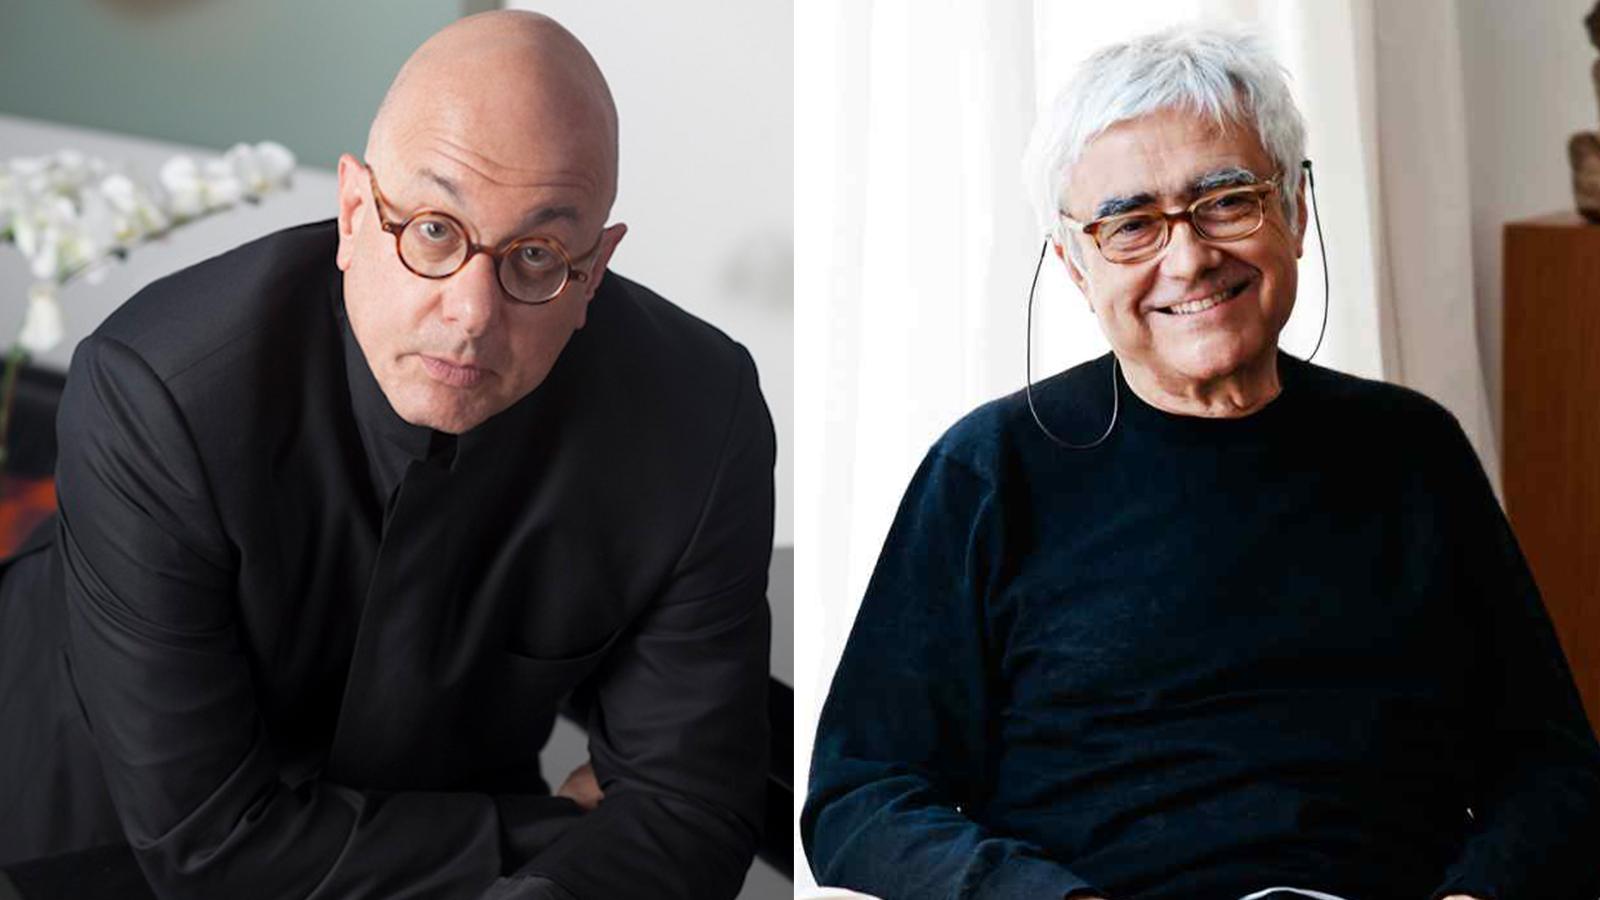 [Leon Botsteinin Conversation withRafael Viñoly] Leon Botstein by Ric Kallaher; Rafael Viñoly by Weston Wells